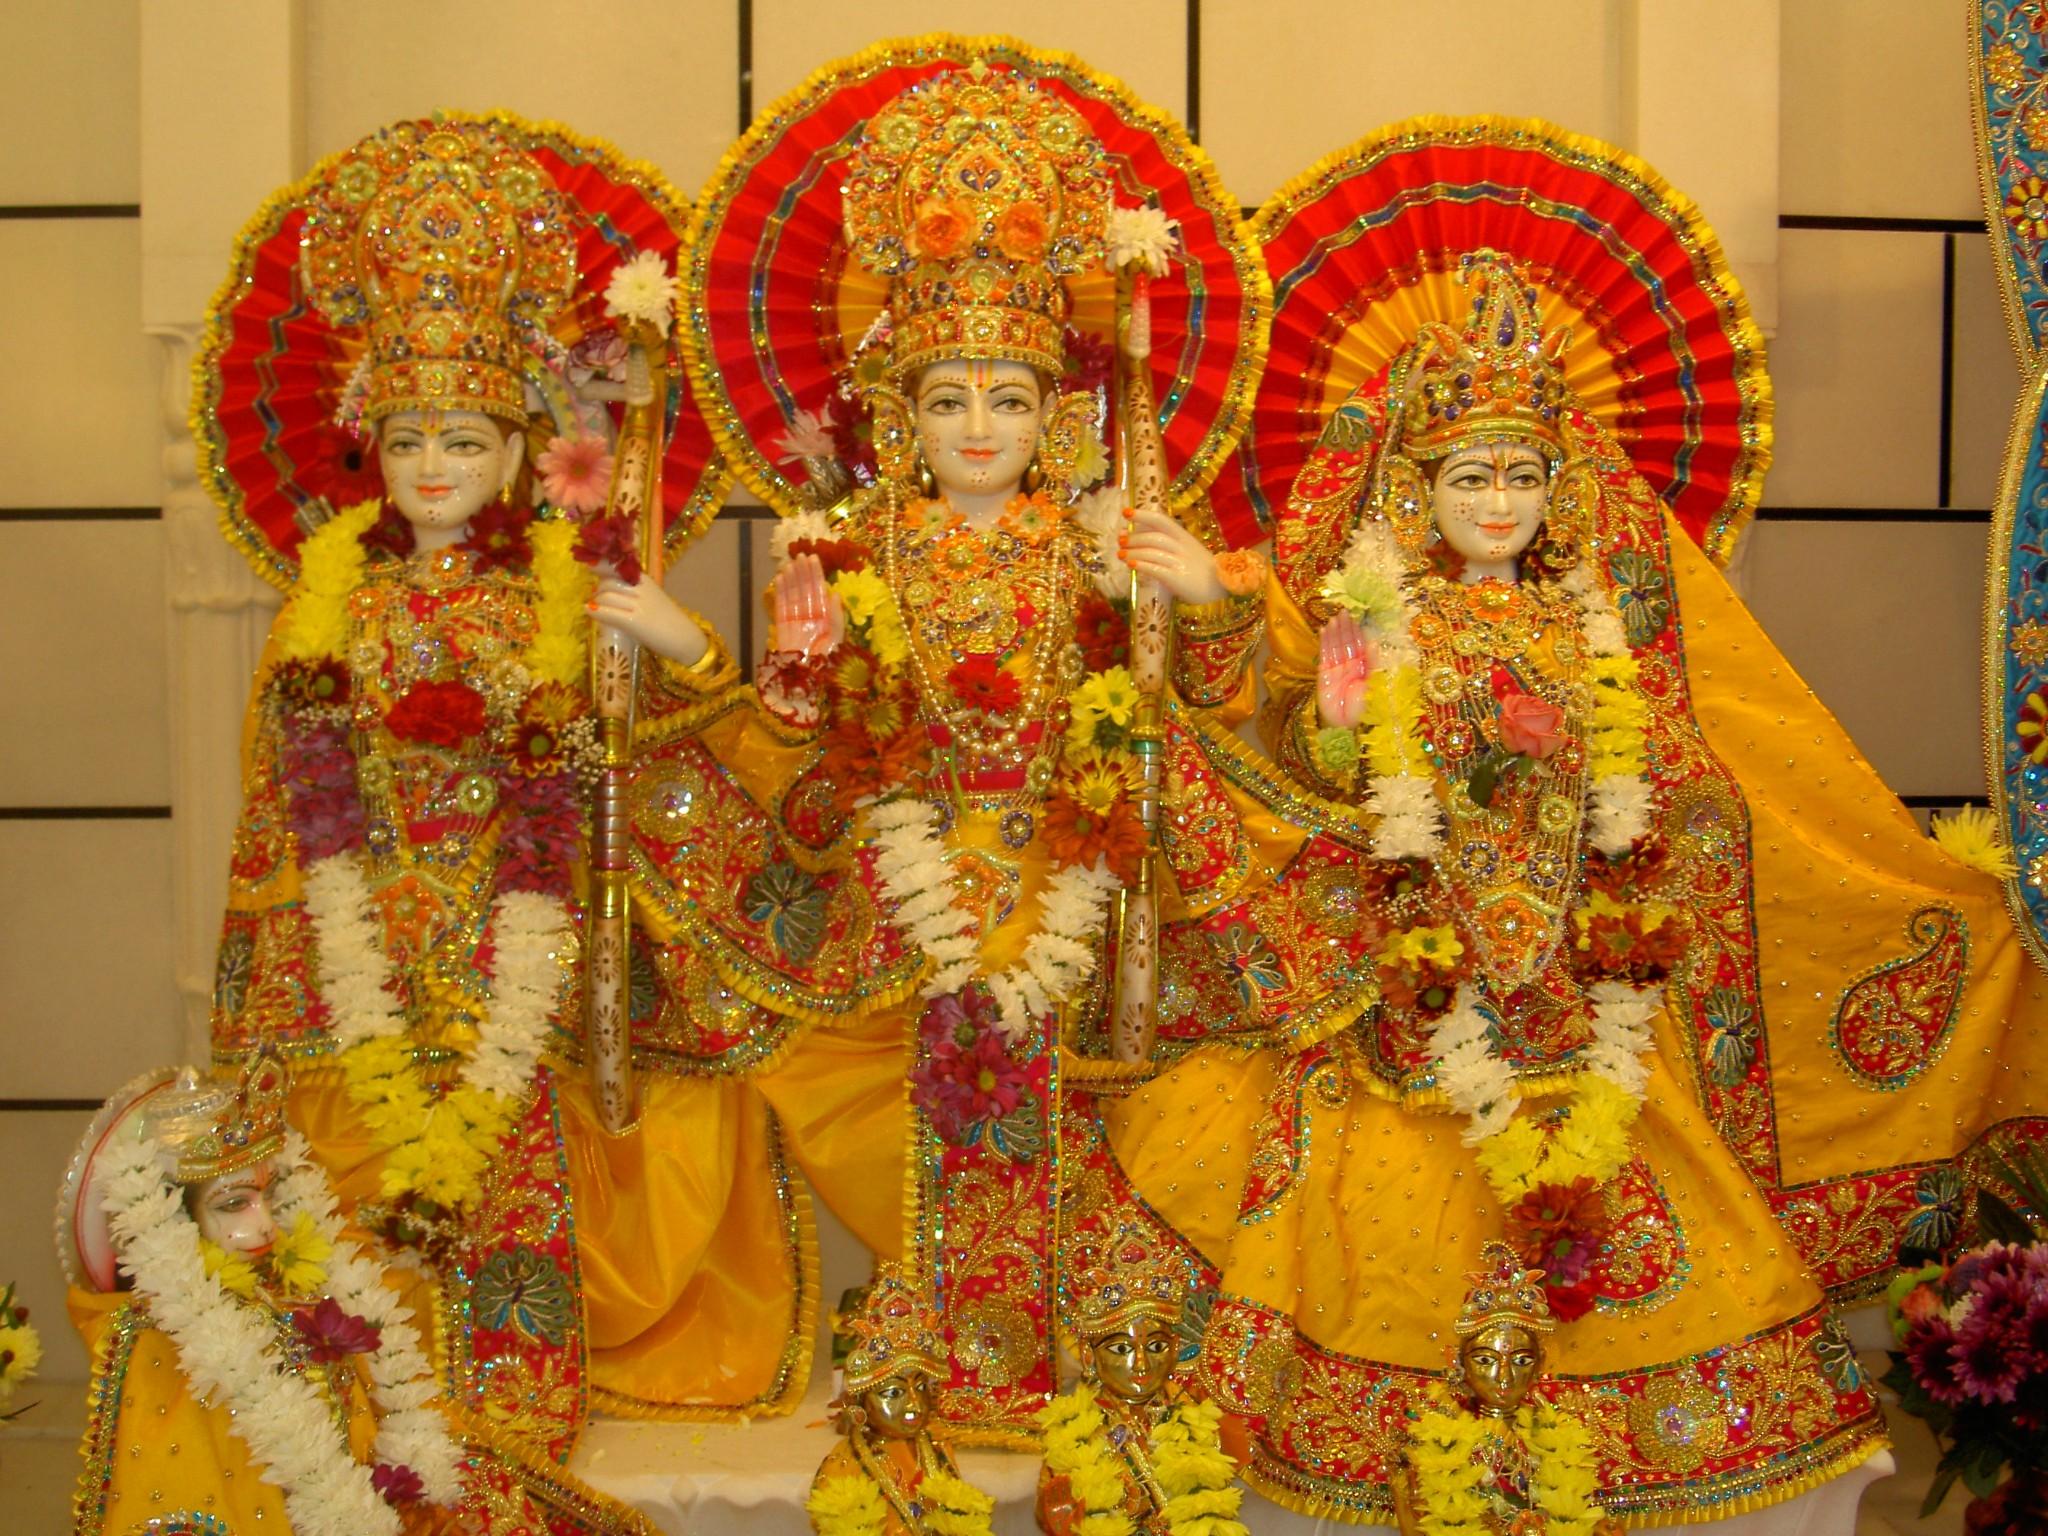 Cute Baby Boy Desktop Wallpaper Amazing Lord Rama Hindu God Shree Ram Wallpaper